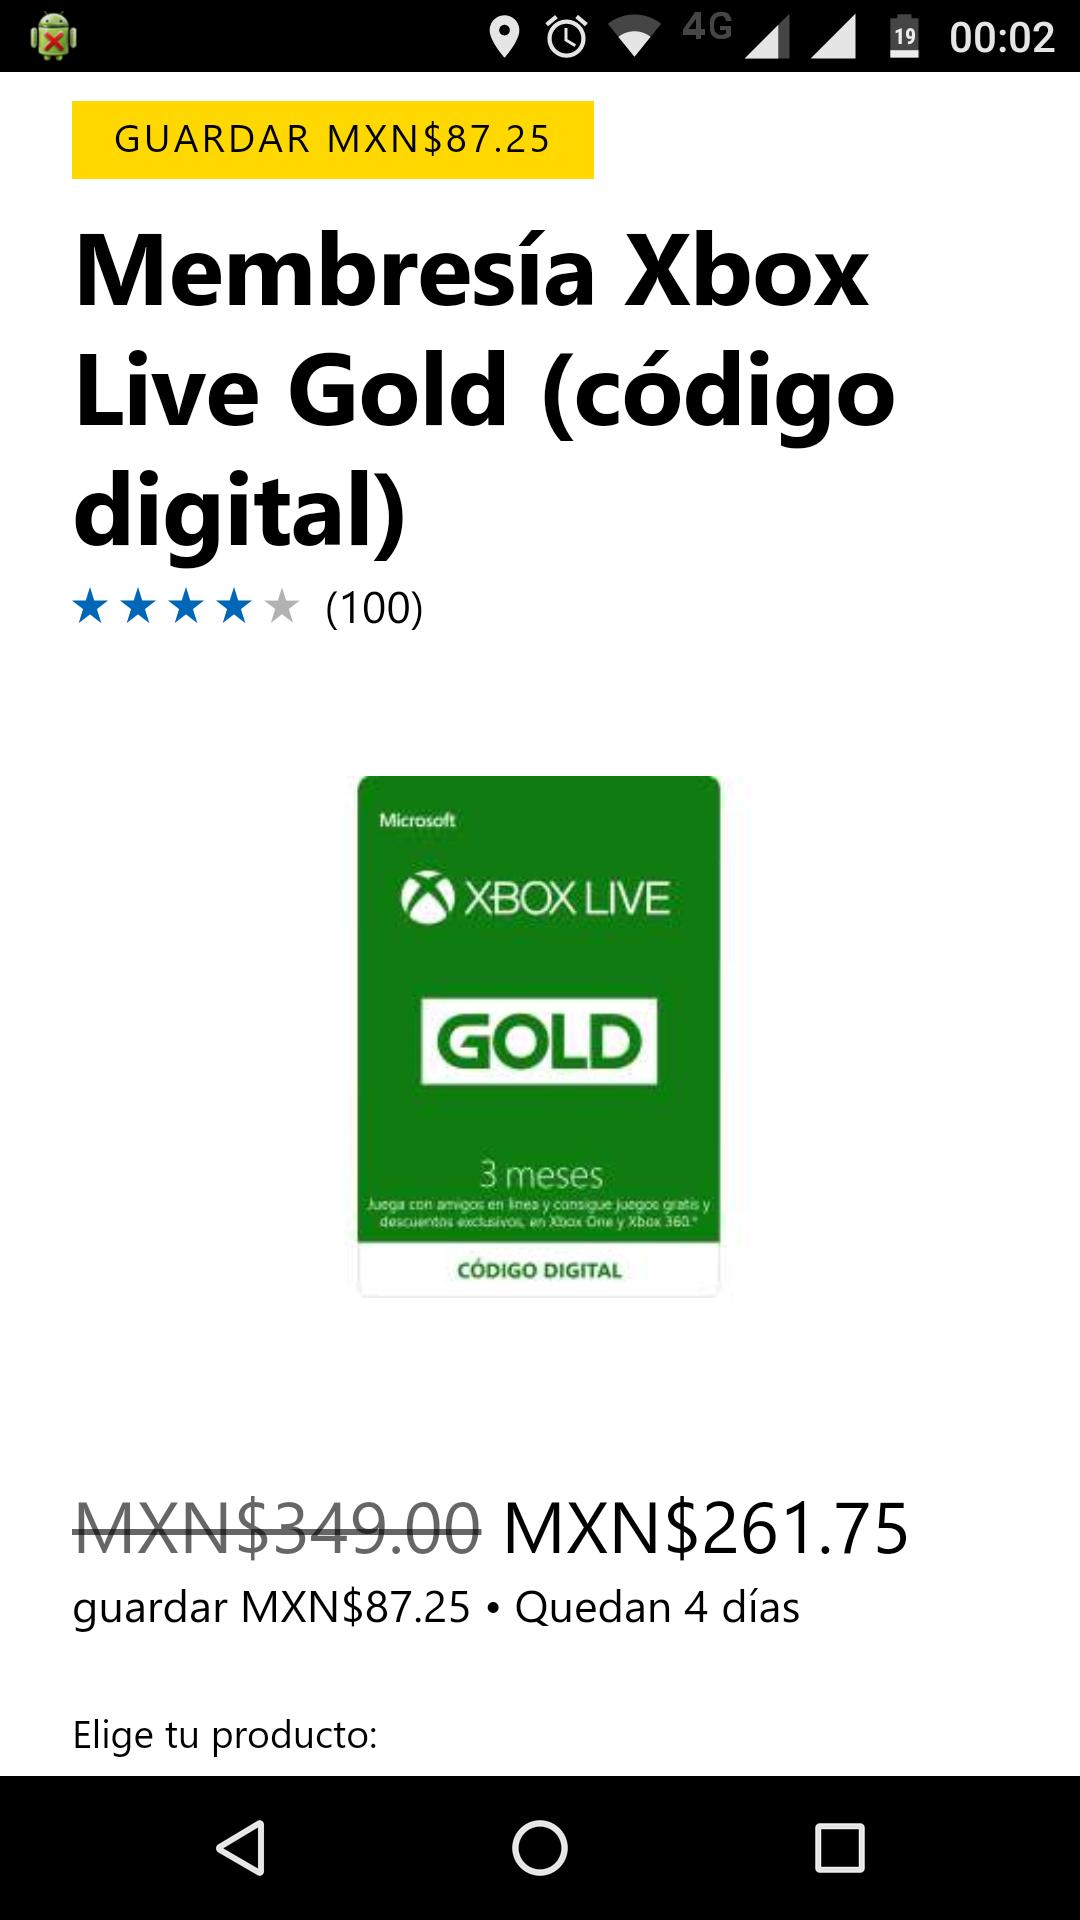 Xbox live gold 3 meses con 25% descuento